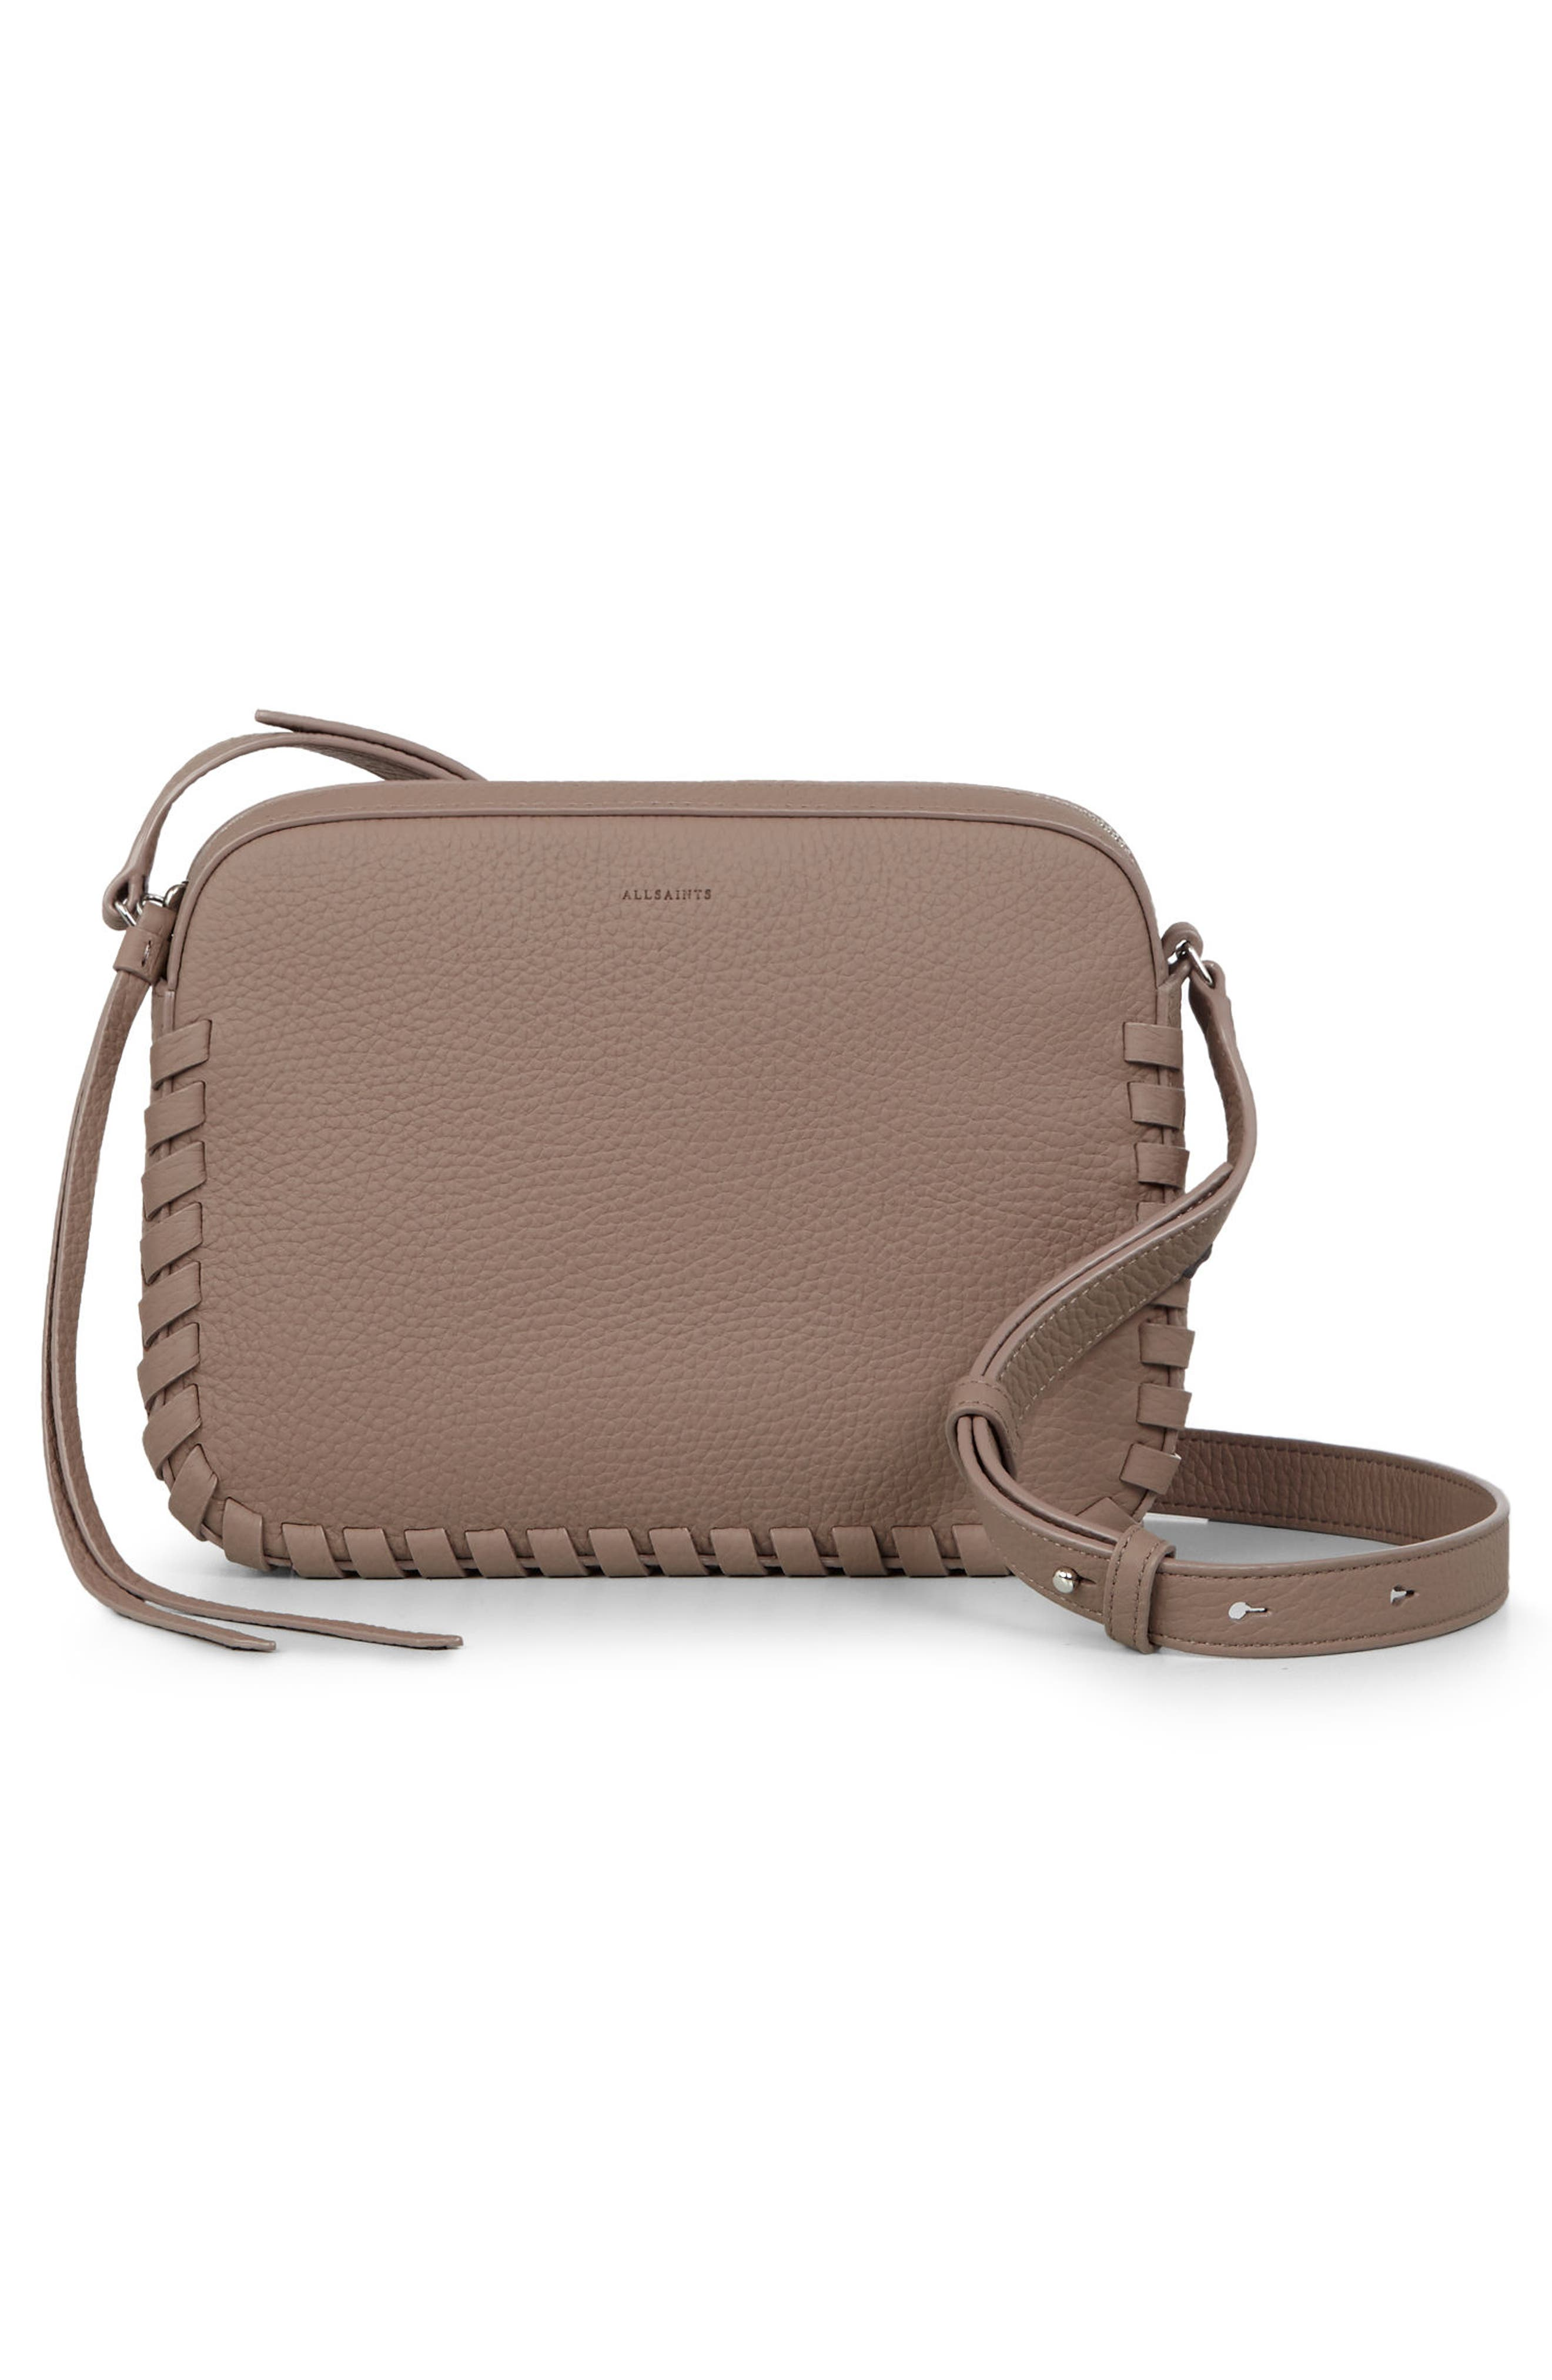 Kepi Mini Leather Crossbody Bag,                             Alternate thumbnail 3, color,                             ALMOND BROWN